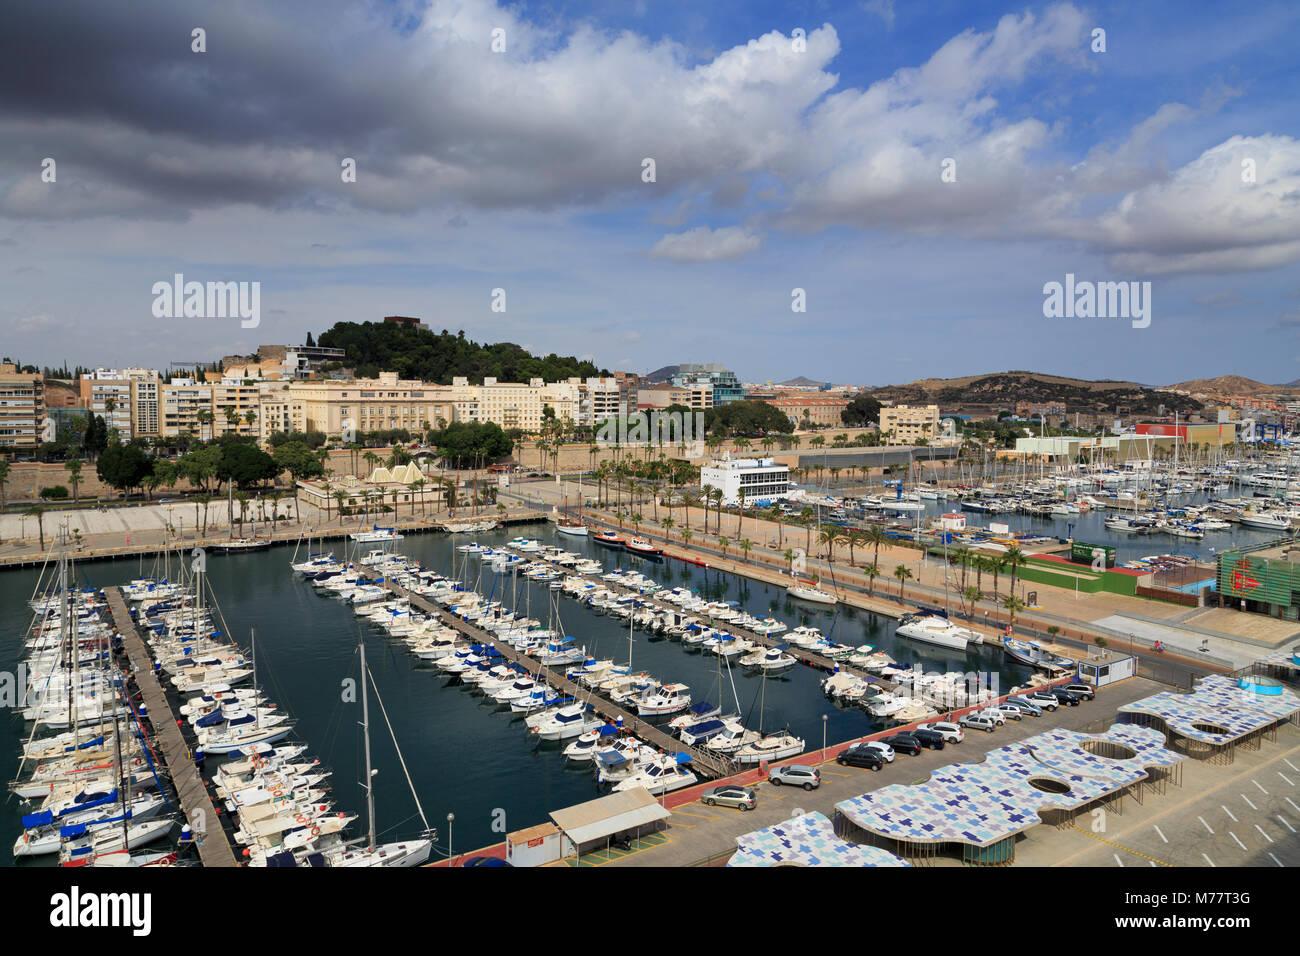 Yacht Marina, Cartagena, Murcia, Spain, Europe Photo Stock